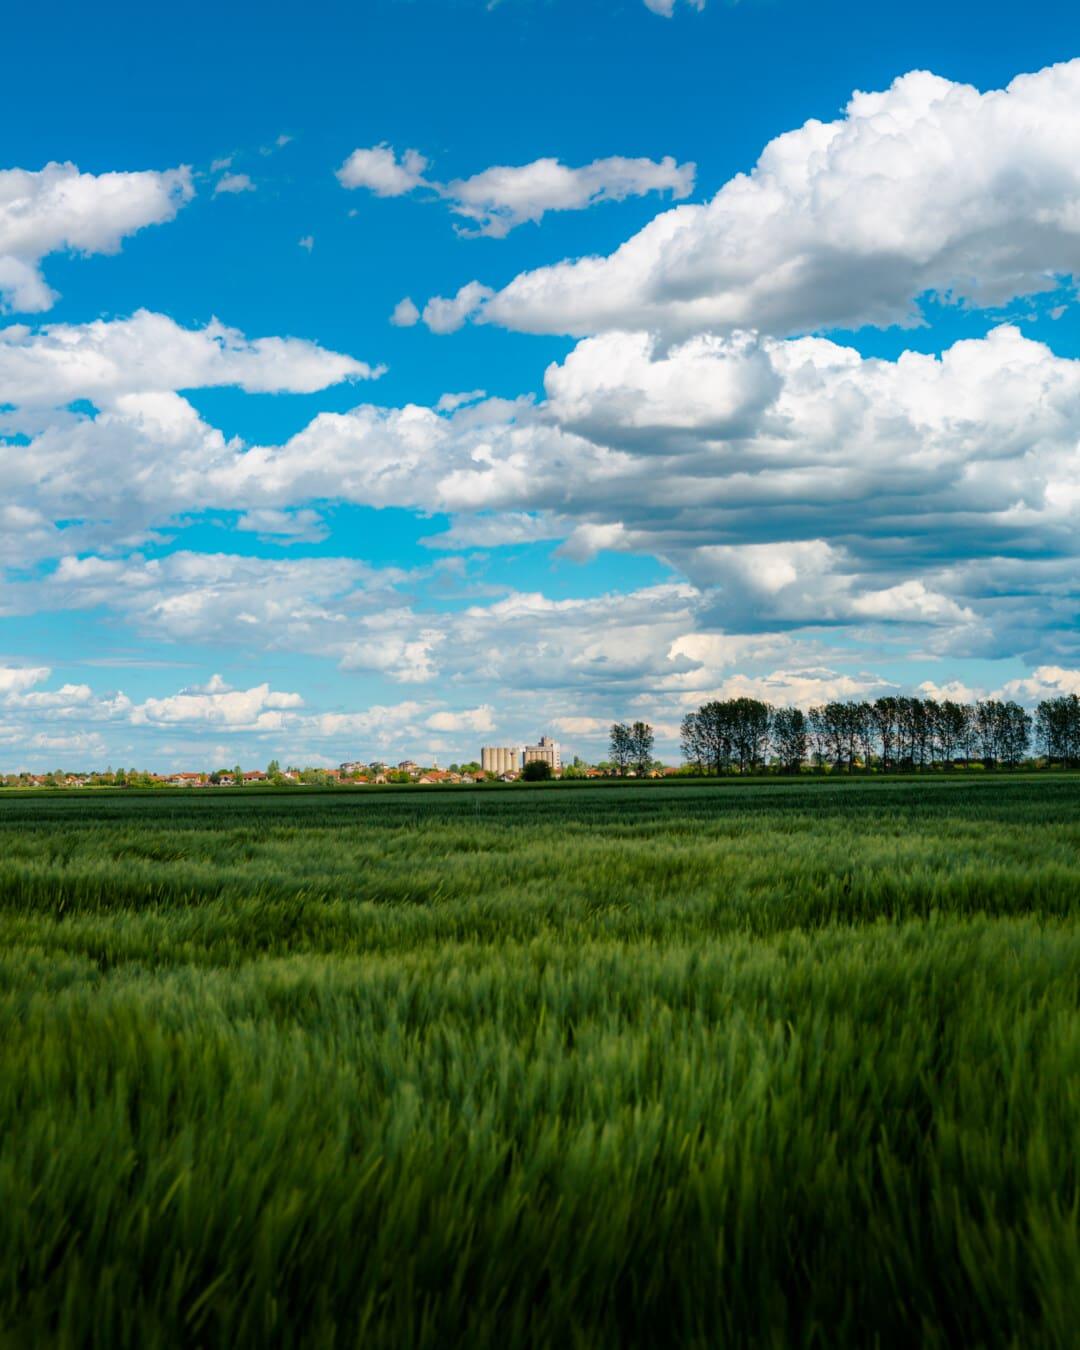 agriculture, daylight, fair weather, wheatfield, idyllic, farm, summer, landscape, cloud, grass